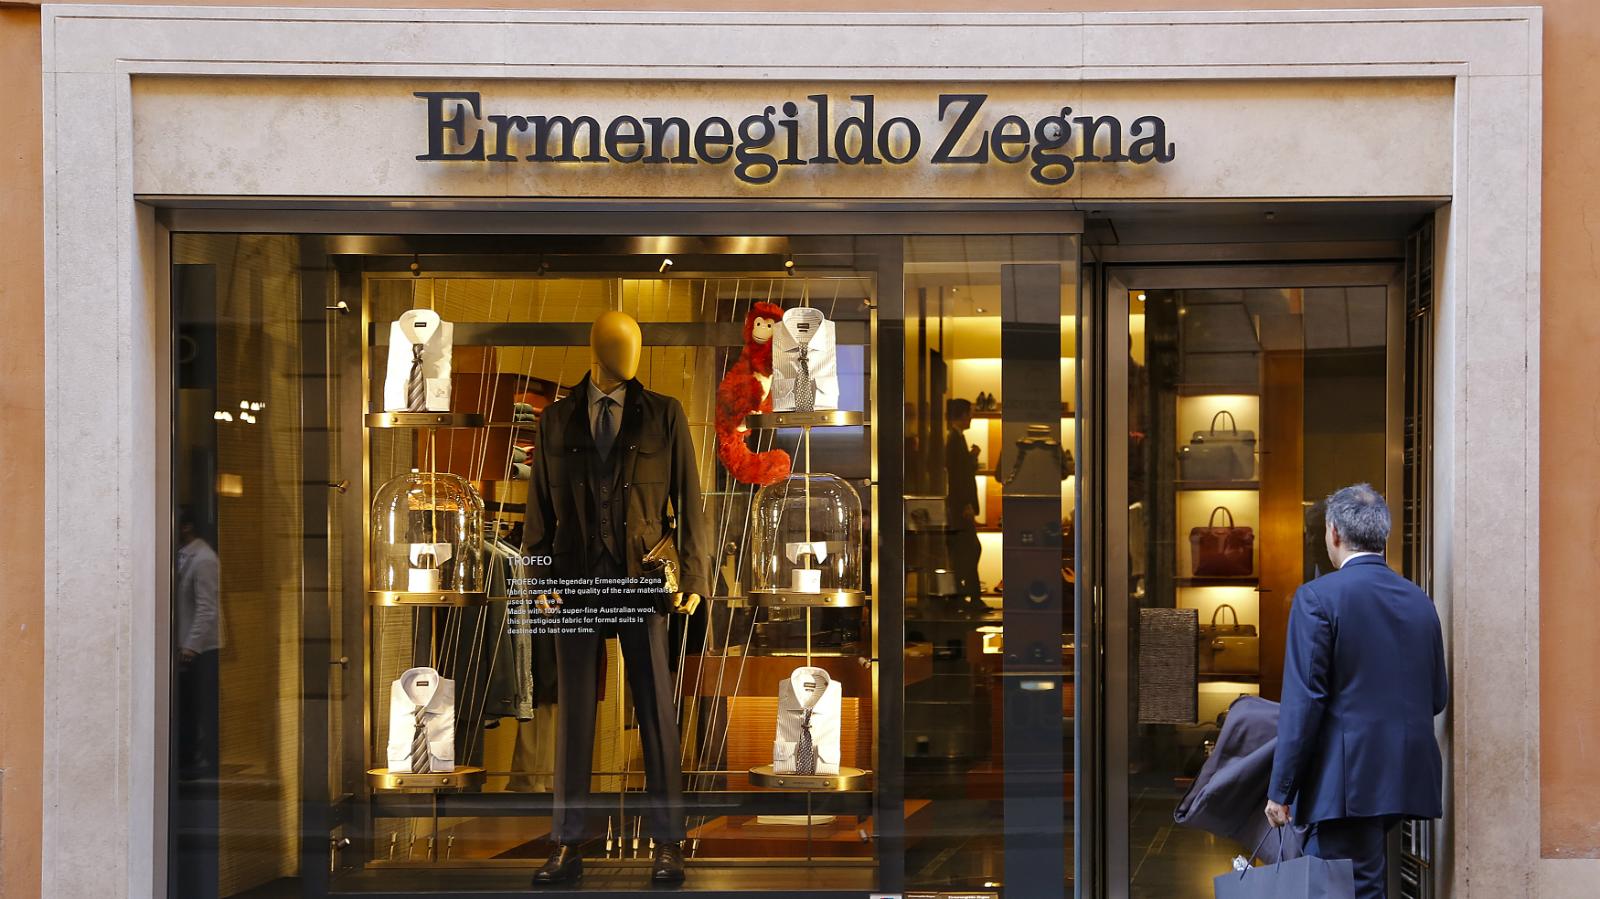 A man walks enters a Ermenegildo Zegna shop in downtown Rome, Italy February 10, 2016.